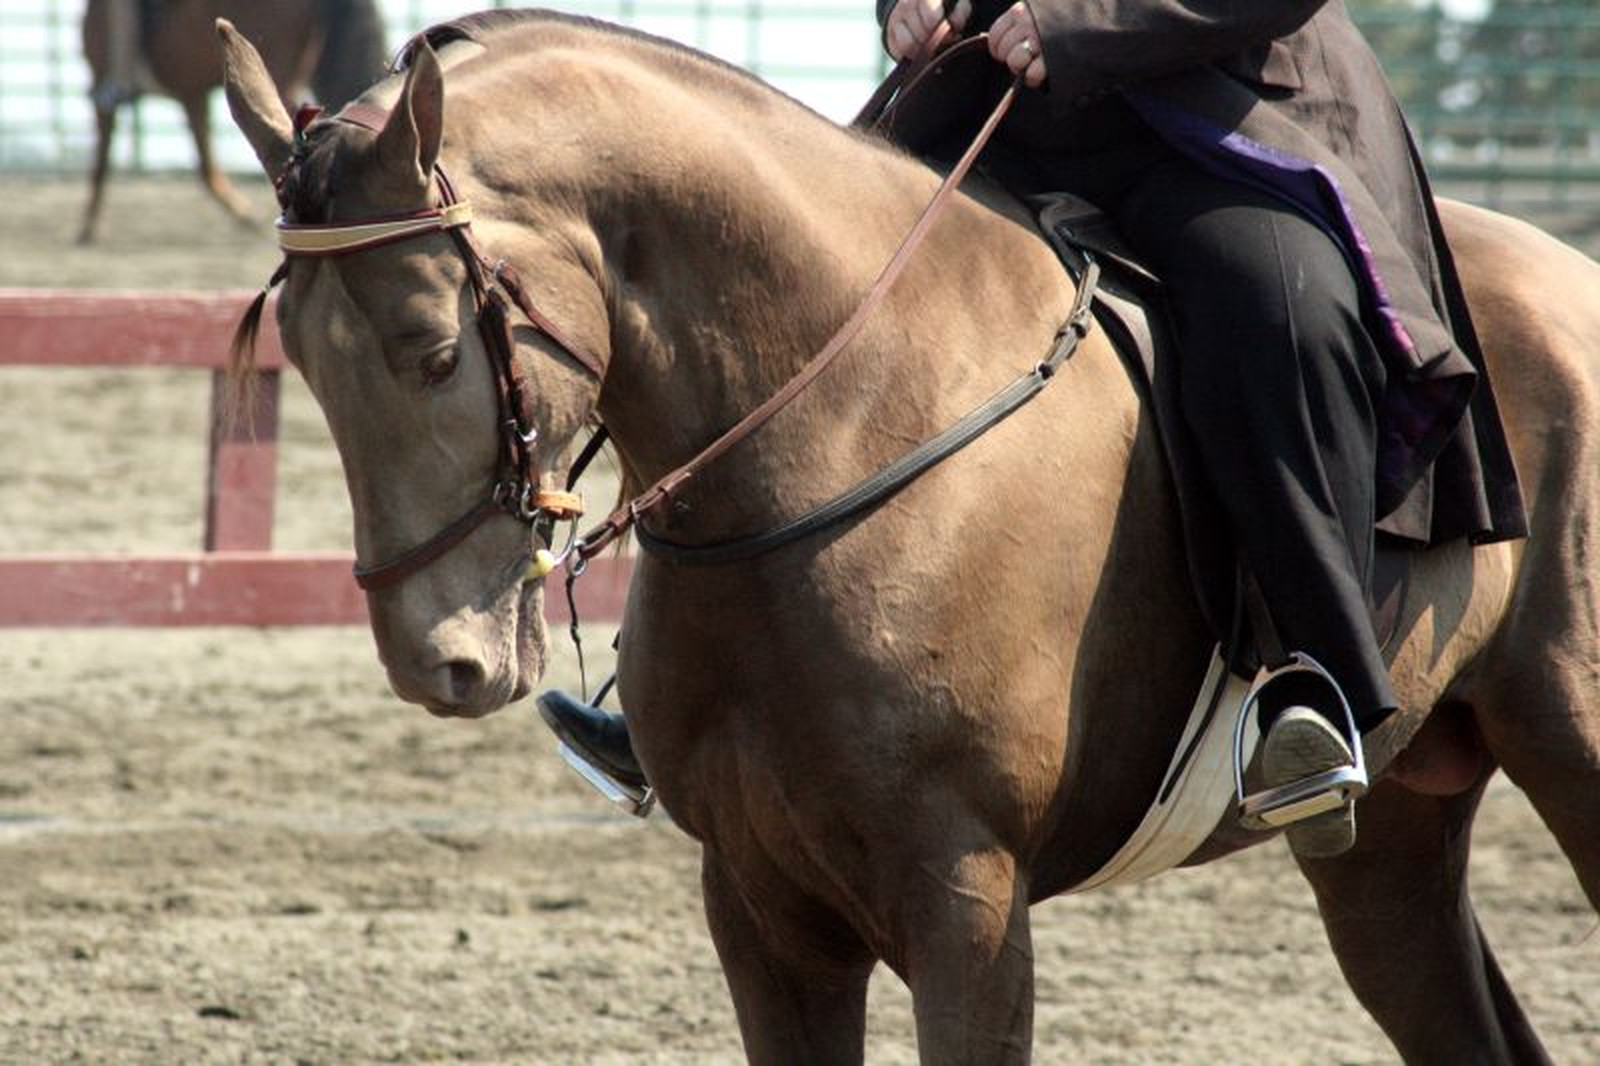 EXPOSED! Tennessee Walking Horse Celebration: Celebrating Cruelty?